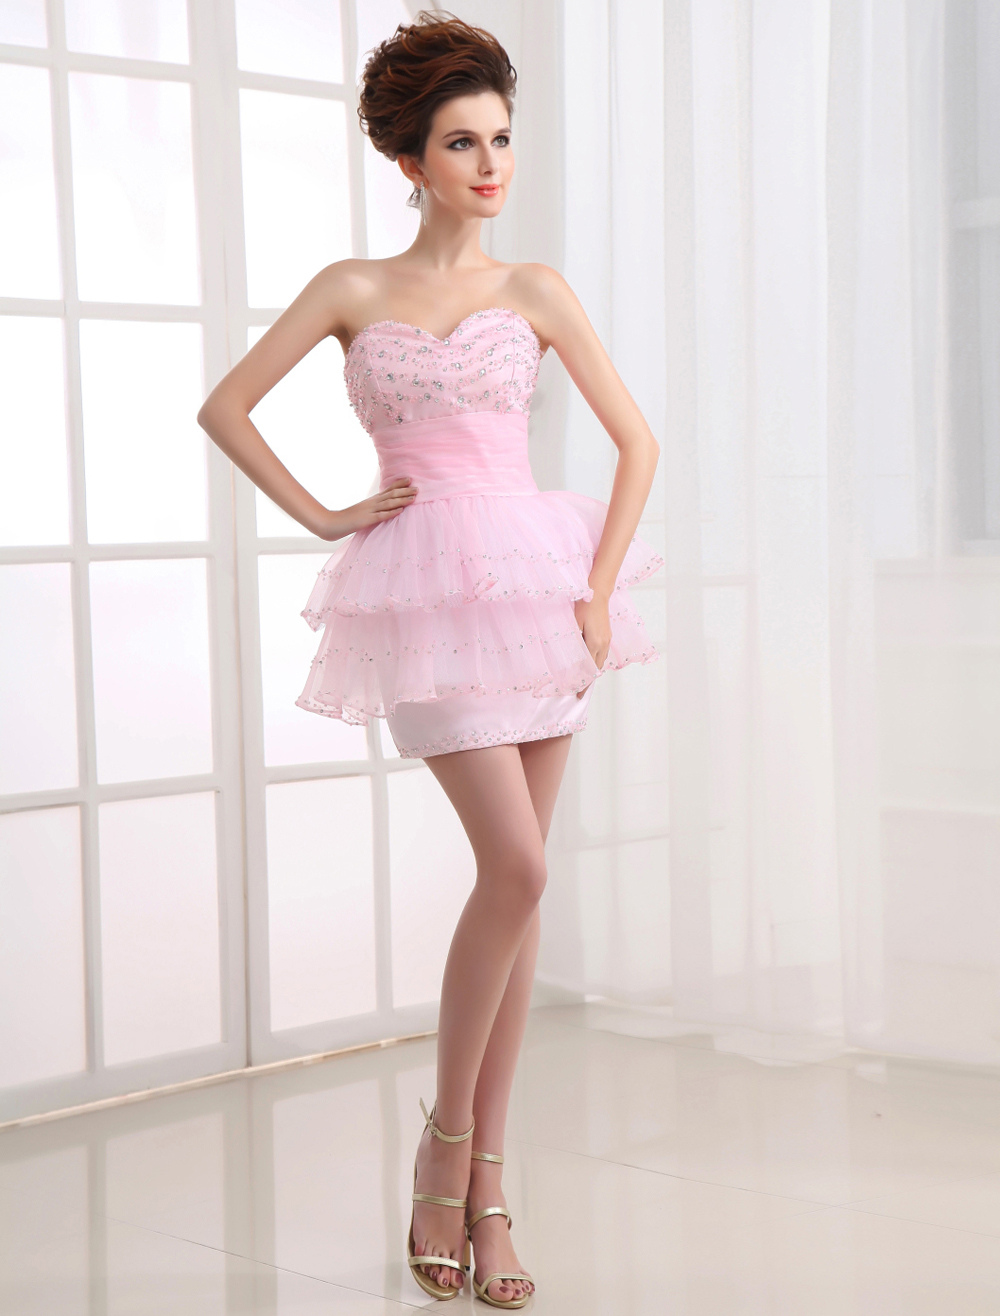 Sexy Pink Organza Satin Knee Length Prom Dress (Wedding Prom Dresses) photo